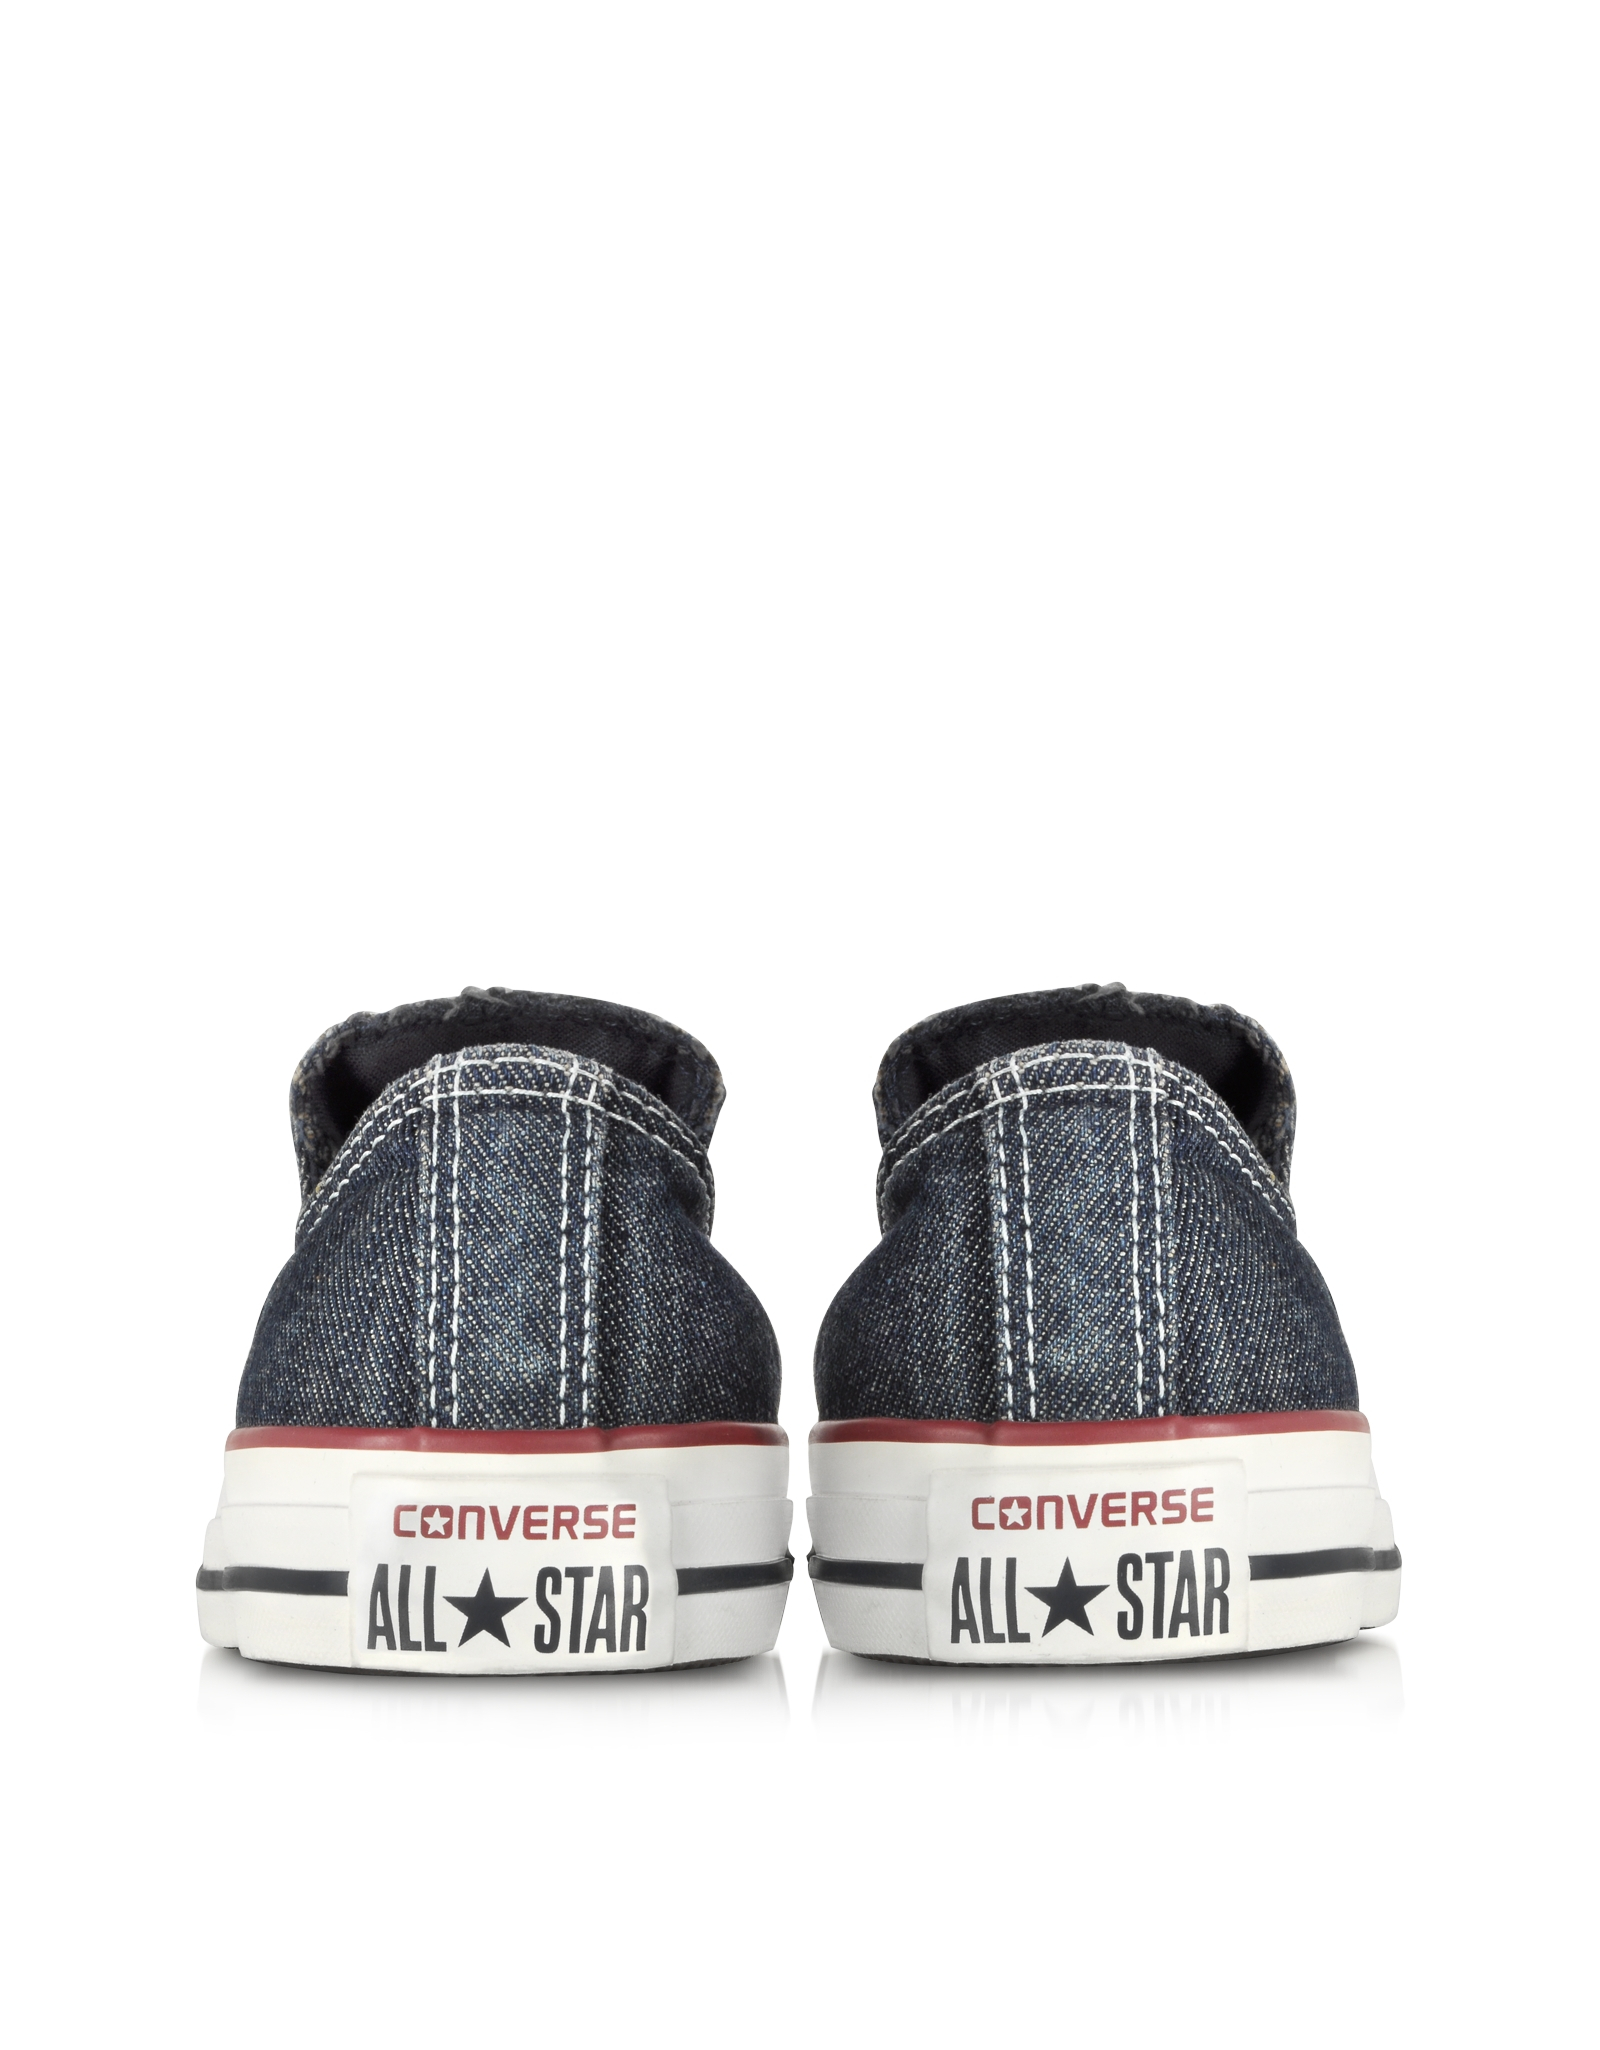 9a03a36b5cd2 Lyst - Converse Chuck Taylor All Star Ox Denim Slip On Sneaker in ...